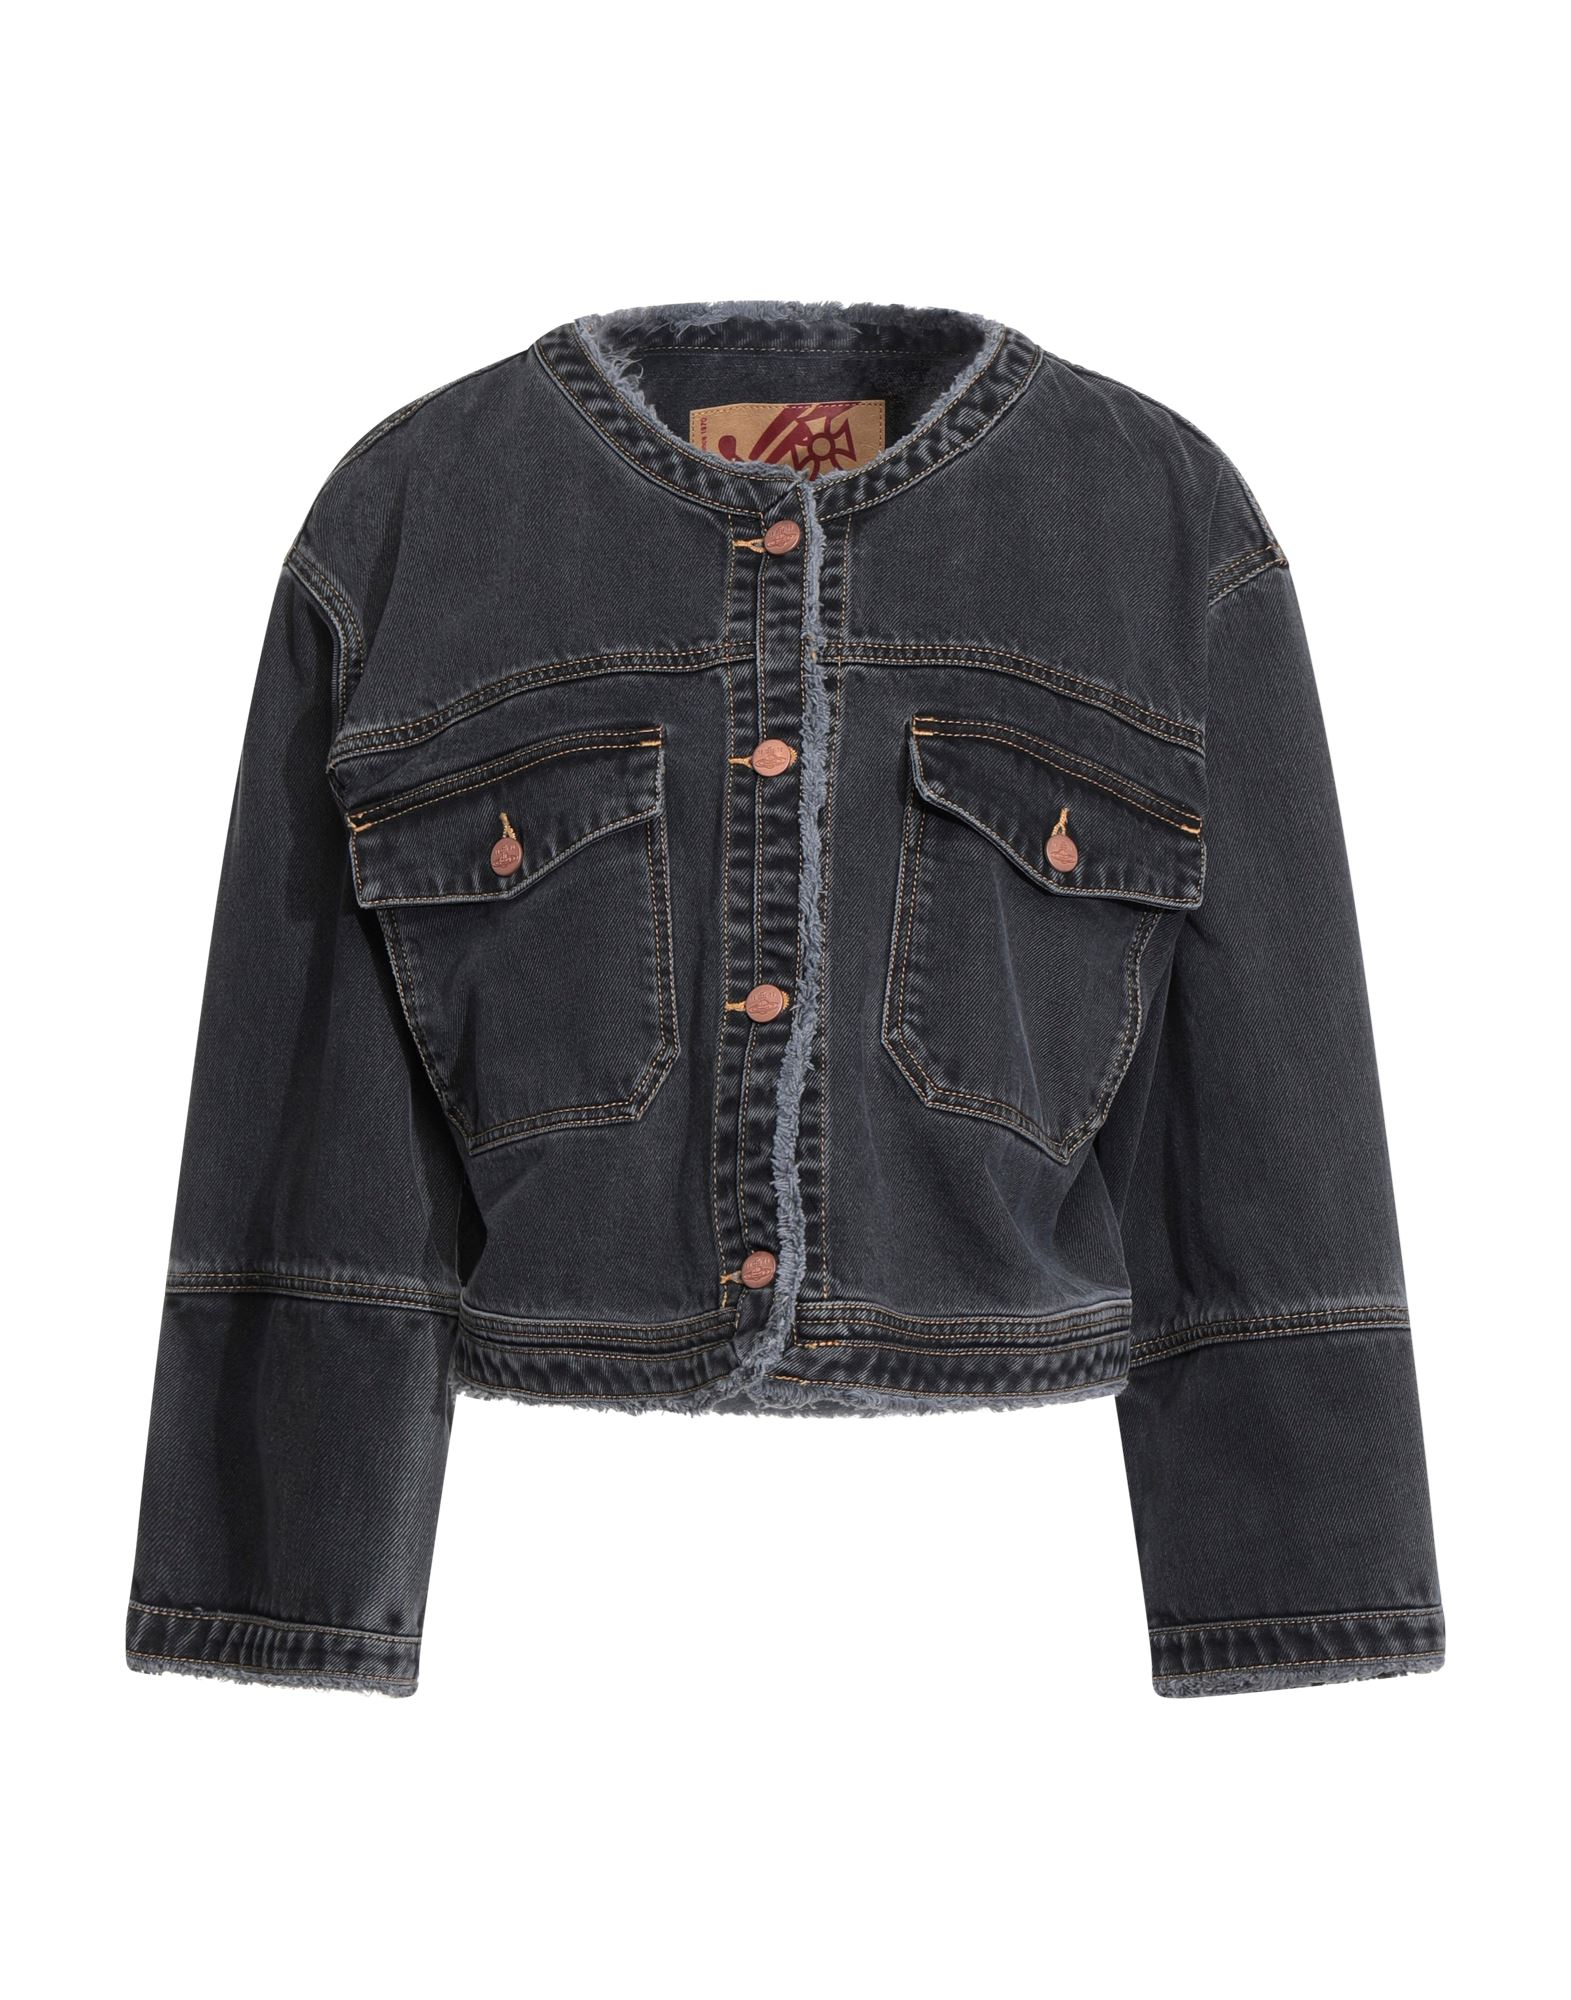 VIVIENNE WESTWOOD ANGLOMANIA Denim outerwear - Item 42836220